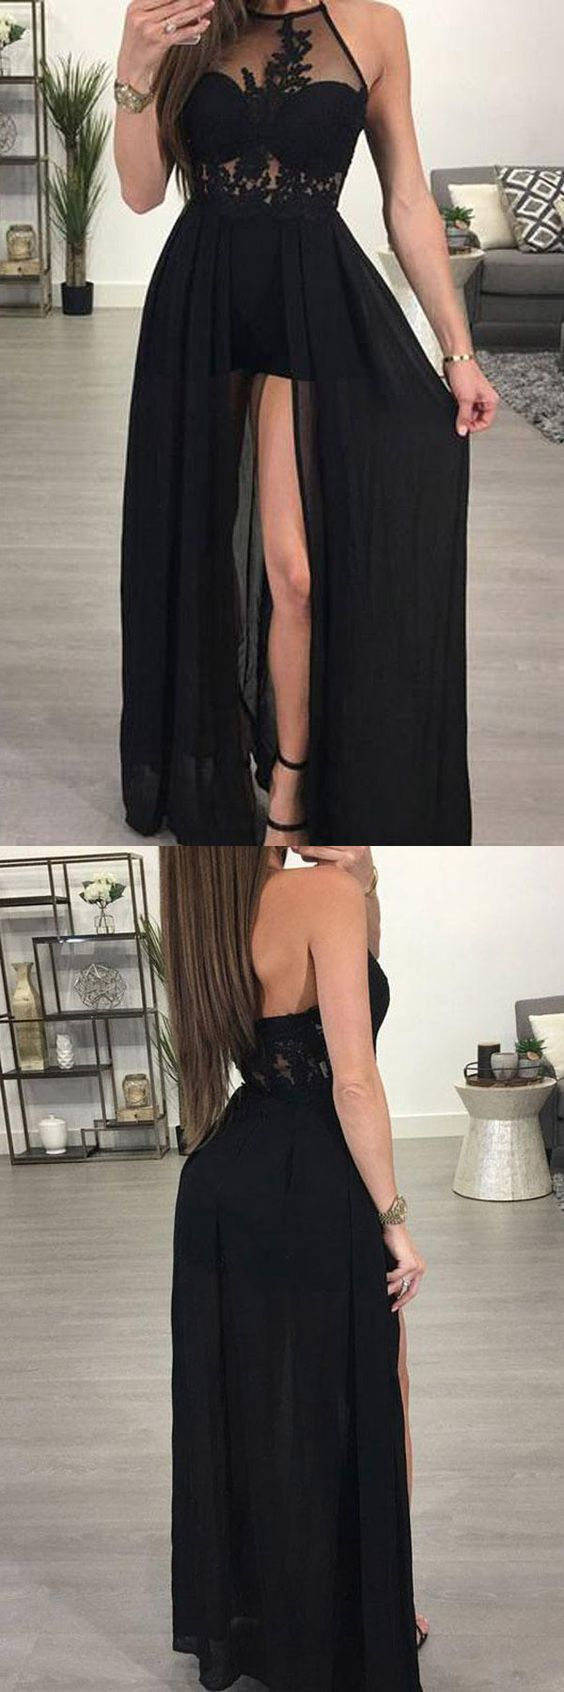 Aline halter black chiffon sexy long prom dresses evening dress